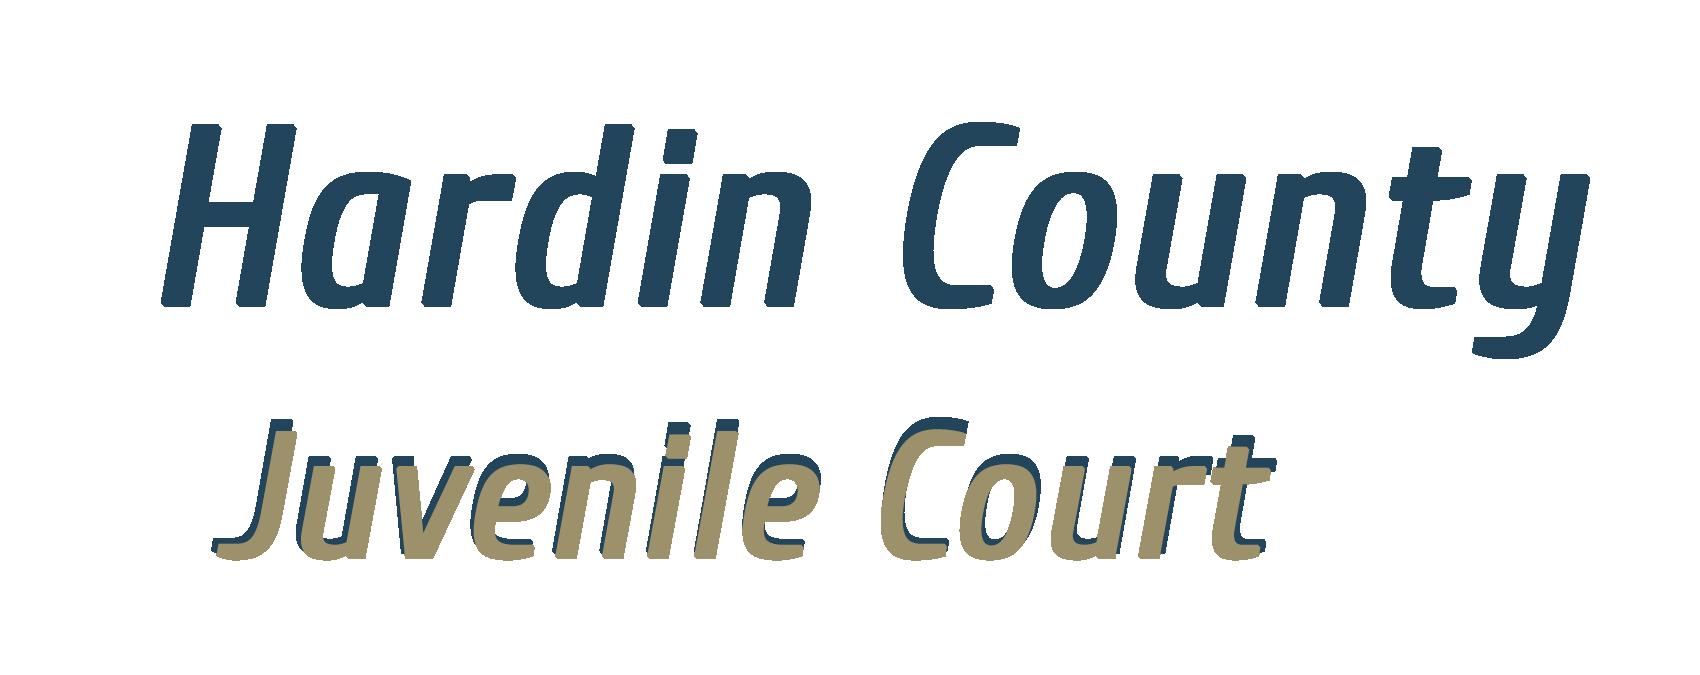 Hardin County Juvenile Court